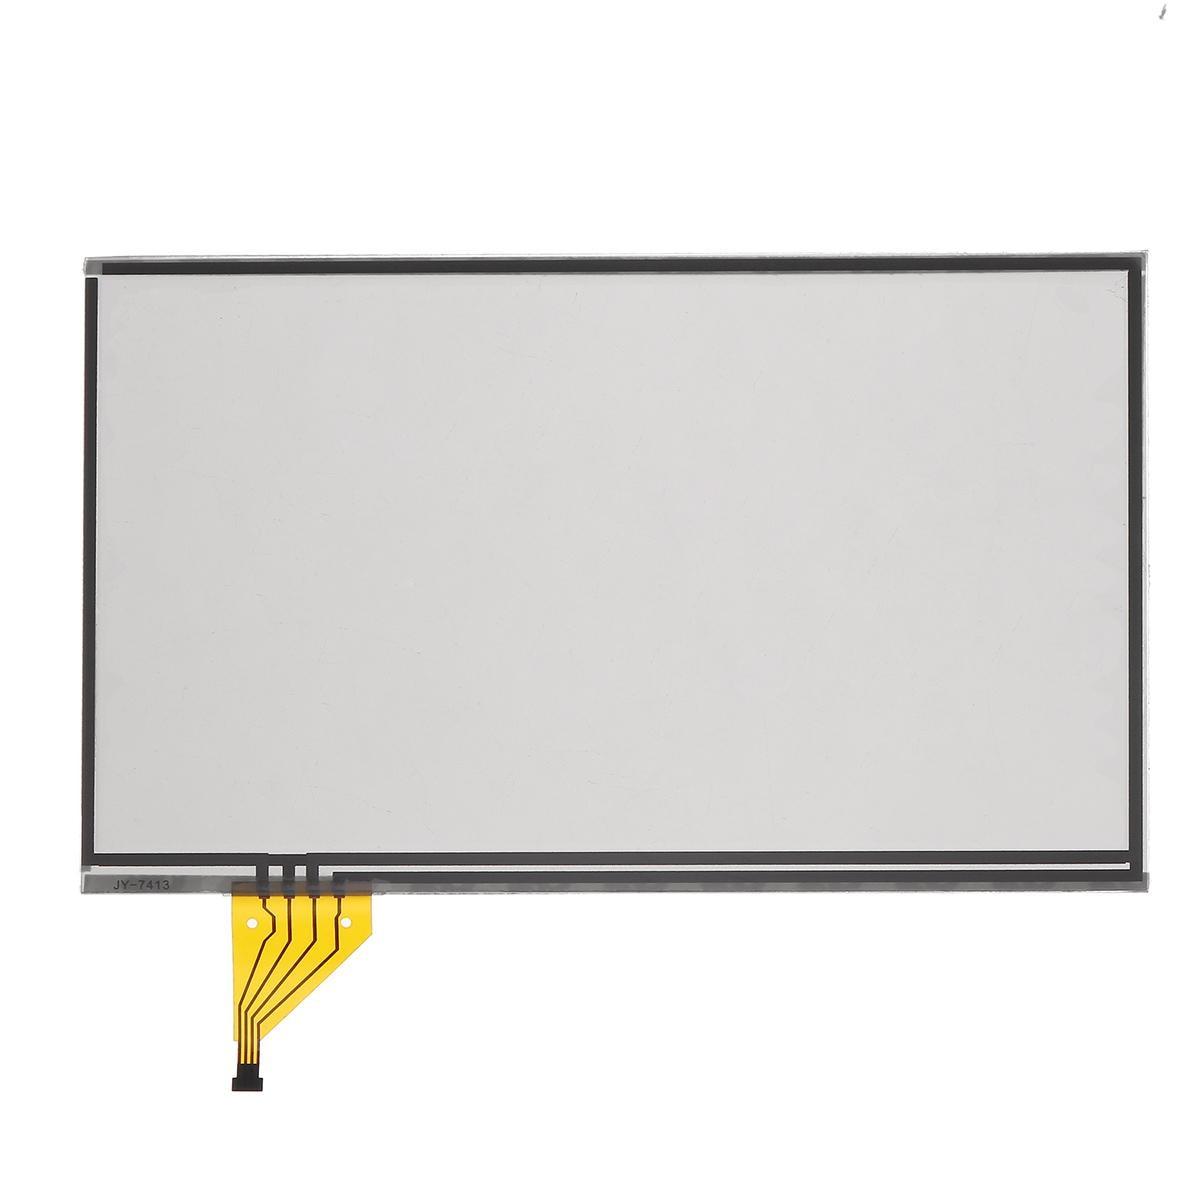 LTA070B512F LTA070B511F LTA070B512F, pantalla táctil de navegación, lente digitalizadora de cristal, pantalla táctil para Lexus para Toyota Prius MDF